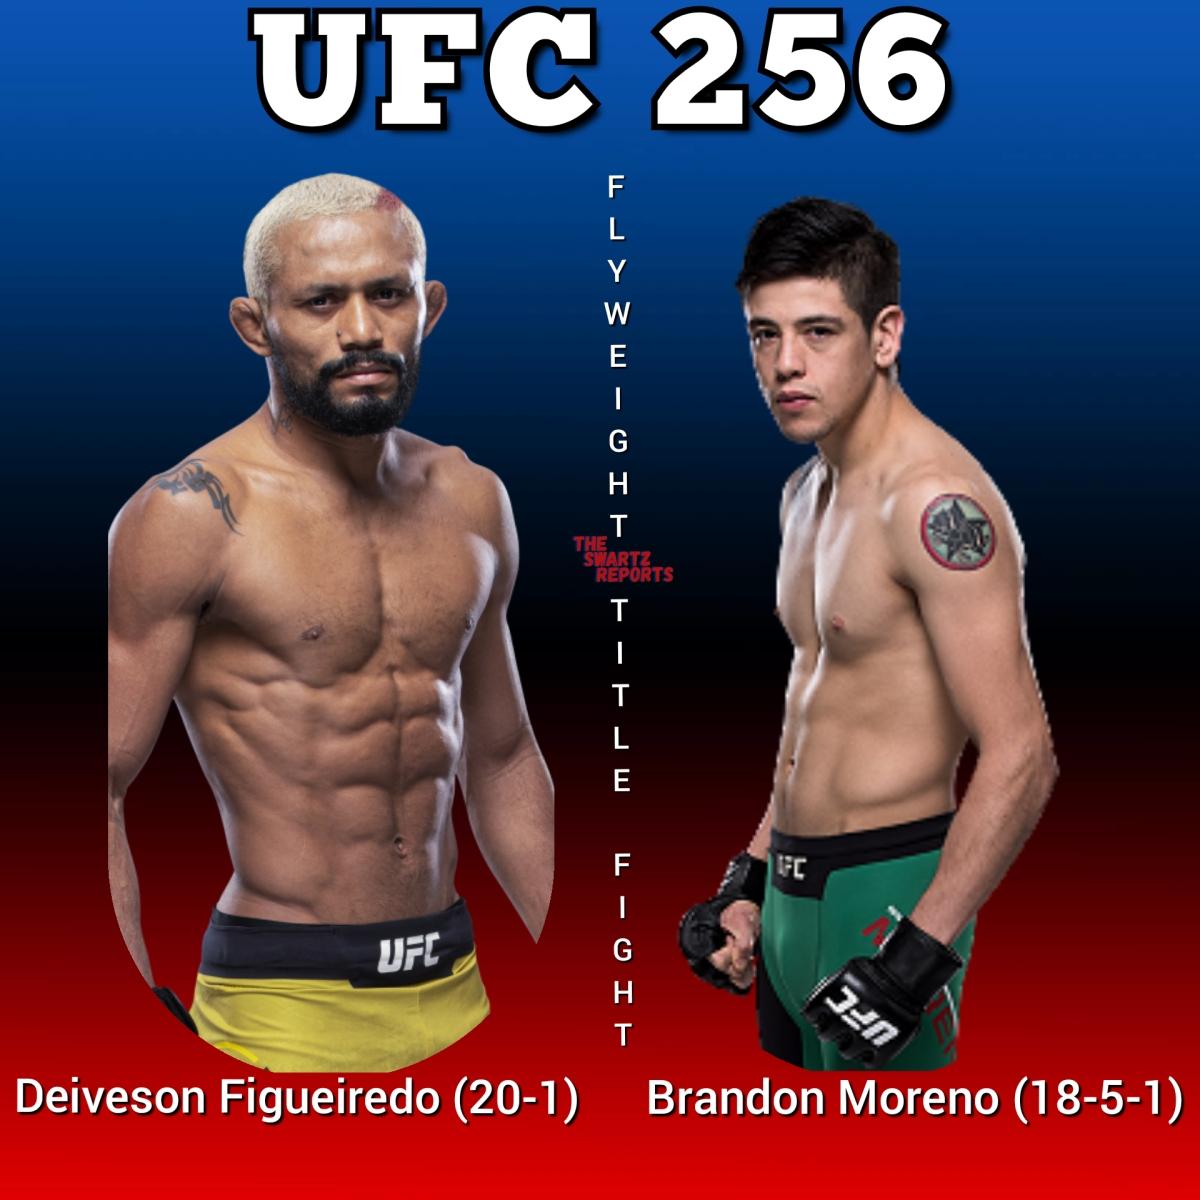 Deiveson Figueiredo vs Brandon Moreno In theWorks